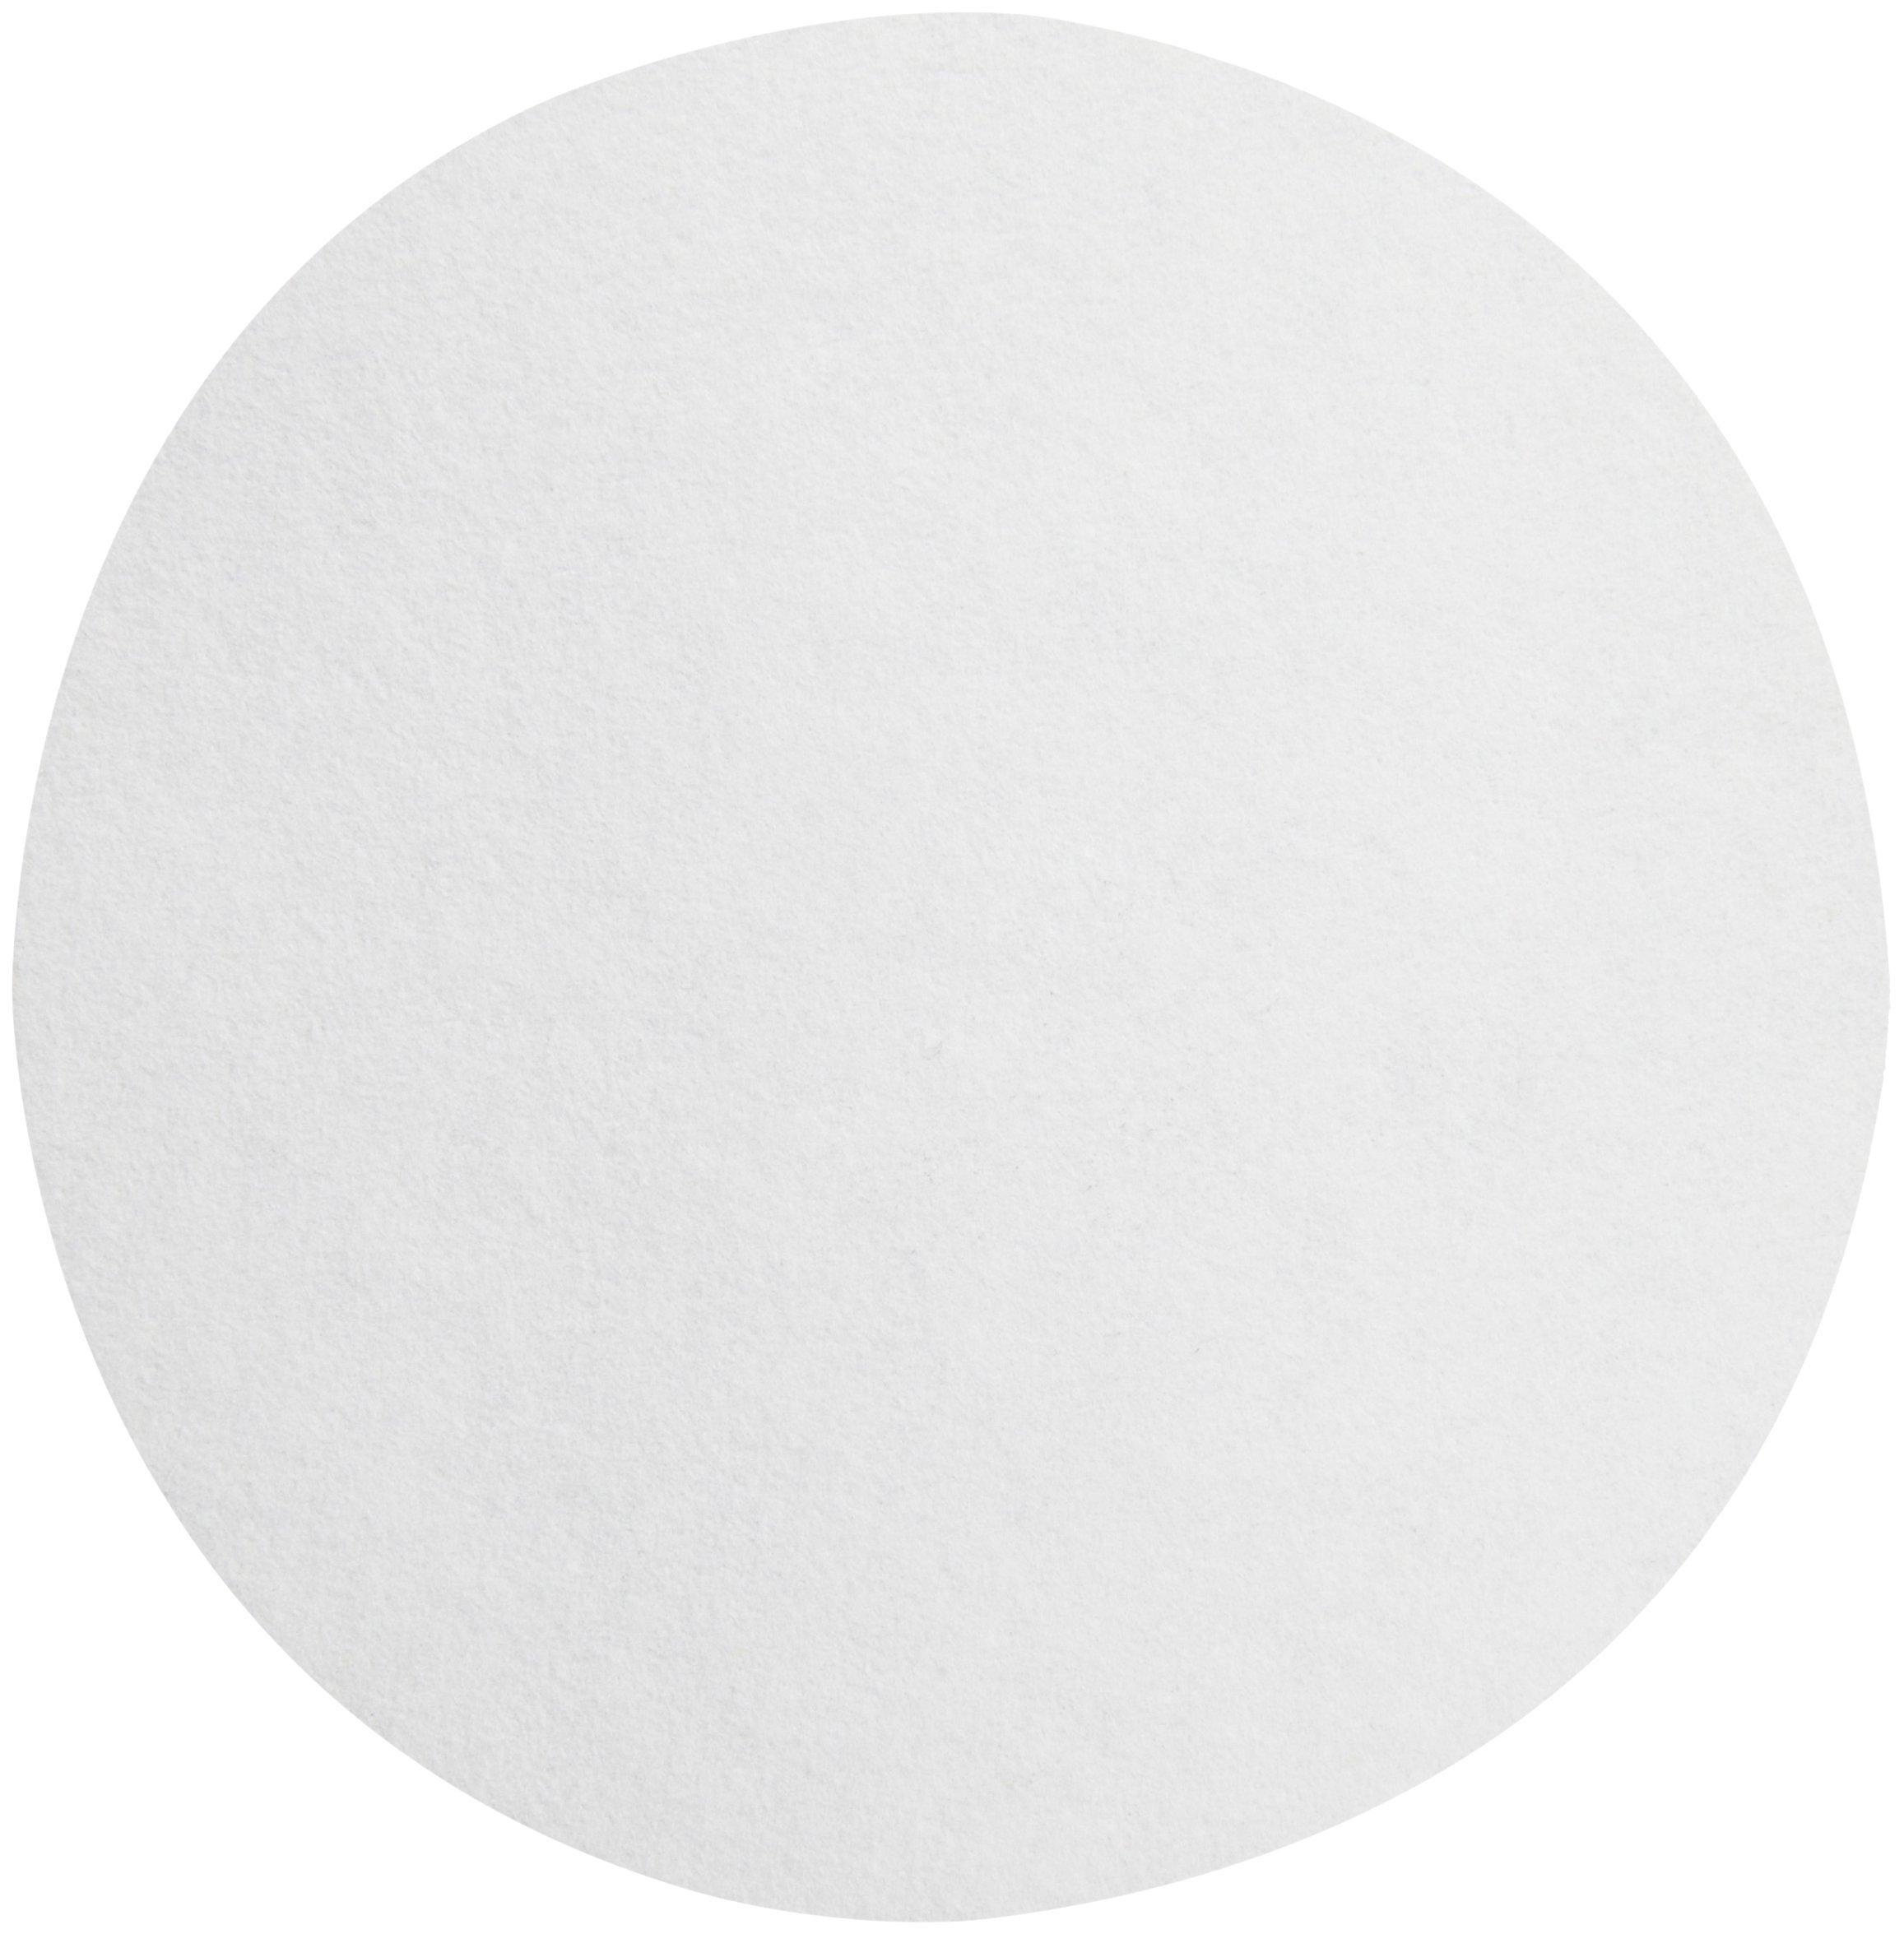 Whatman 1440-070 Ashless Quantitative Filter Paper, 7.0cm Diameter, 8 Micron, Grade 40 (Pack of 100)